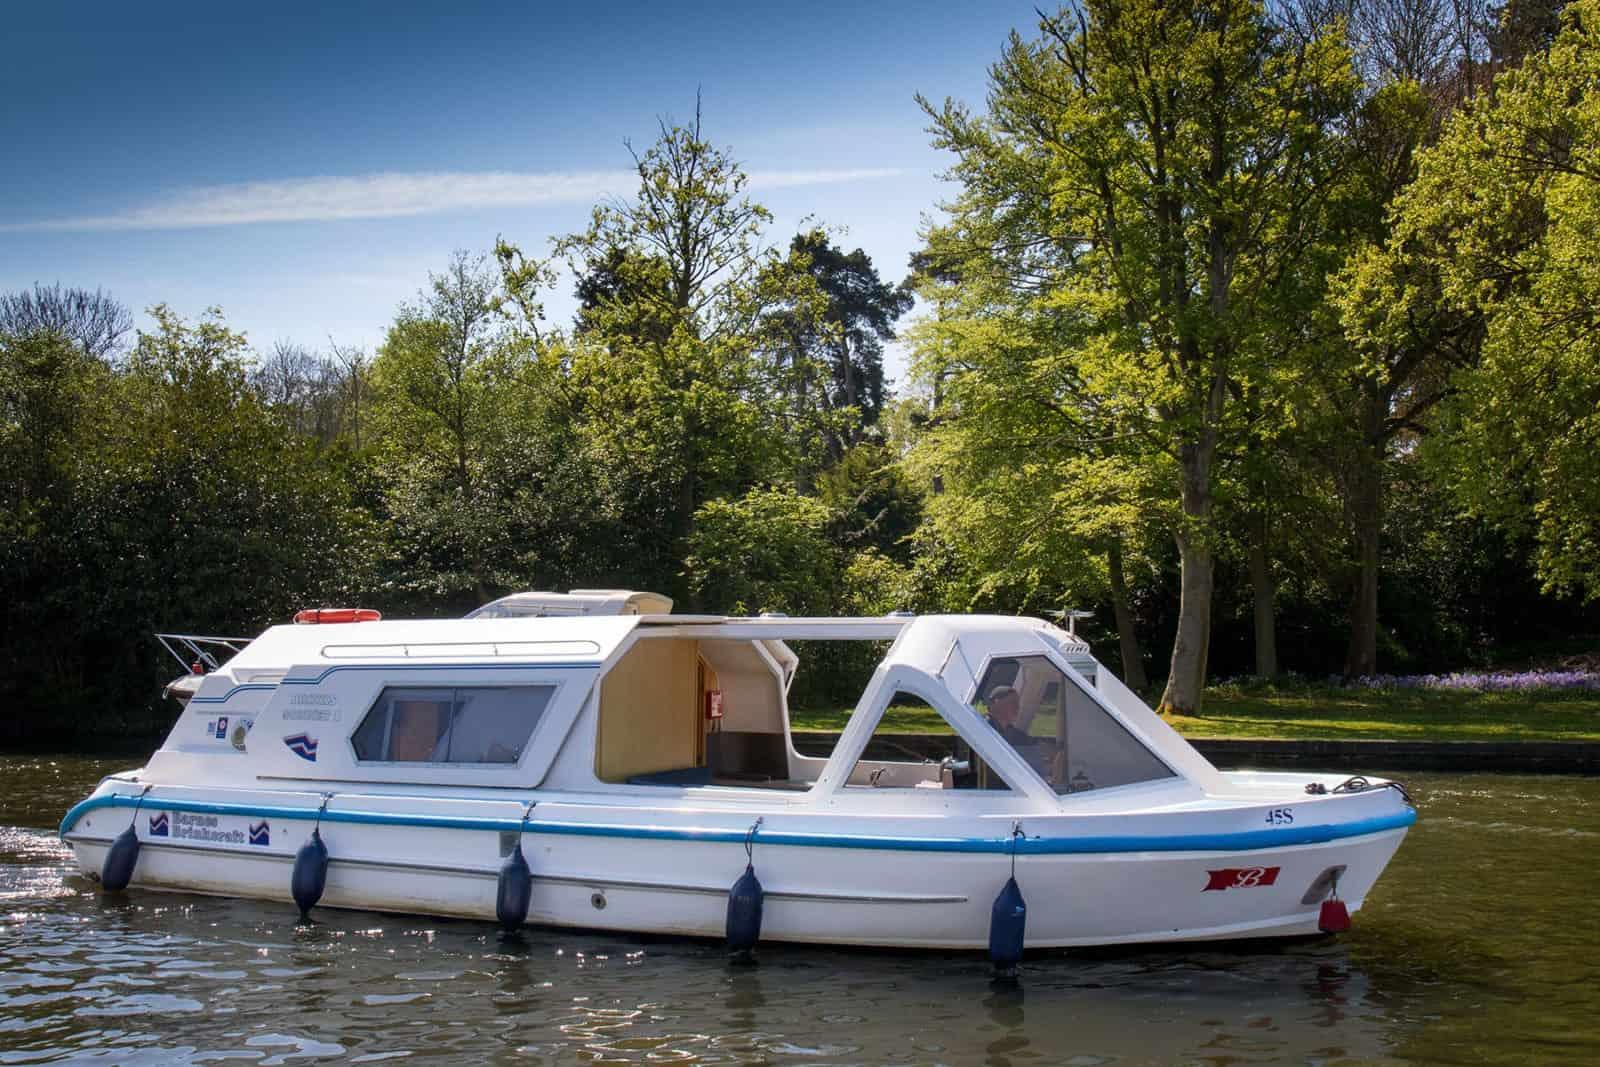 Sonnet 2 Berth Norfolk Broads Cruiser for hire